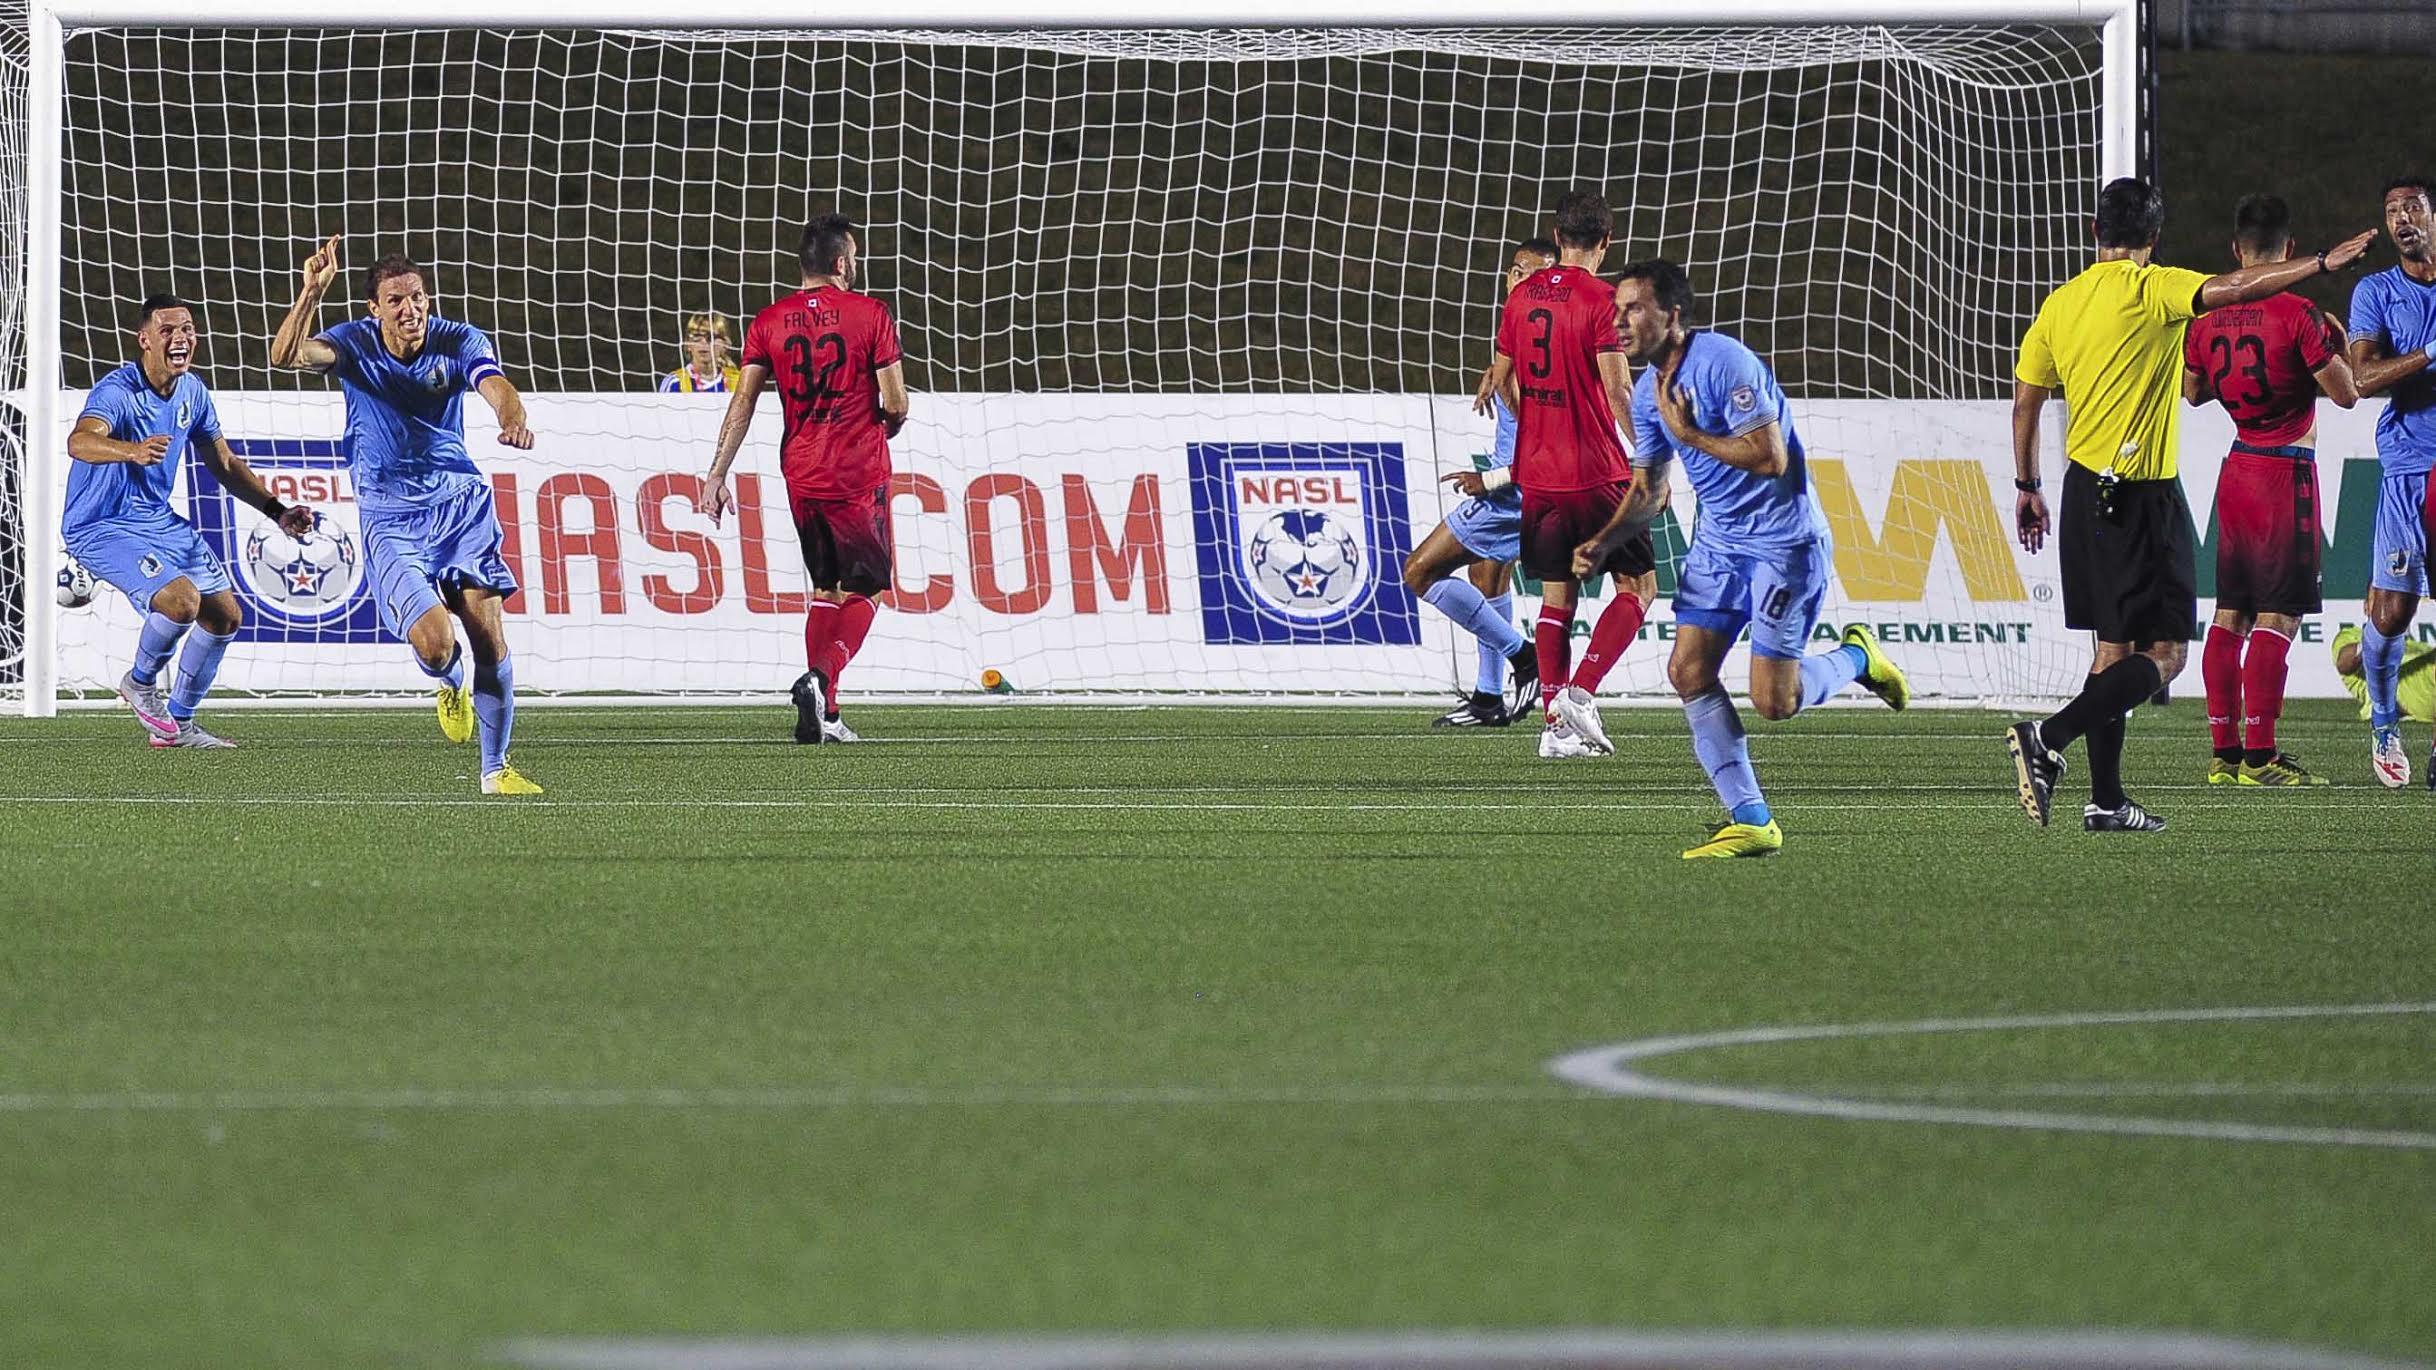 Daniel Mendes celebrates his game winning free kick. (Photo: Ottawa Fury FC)